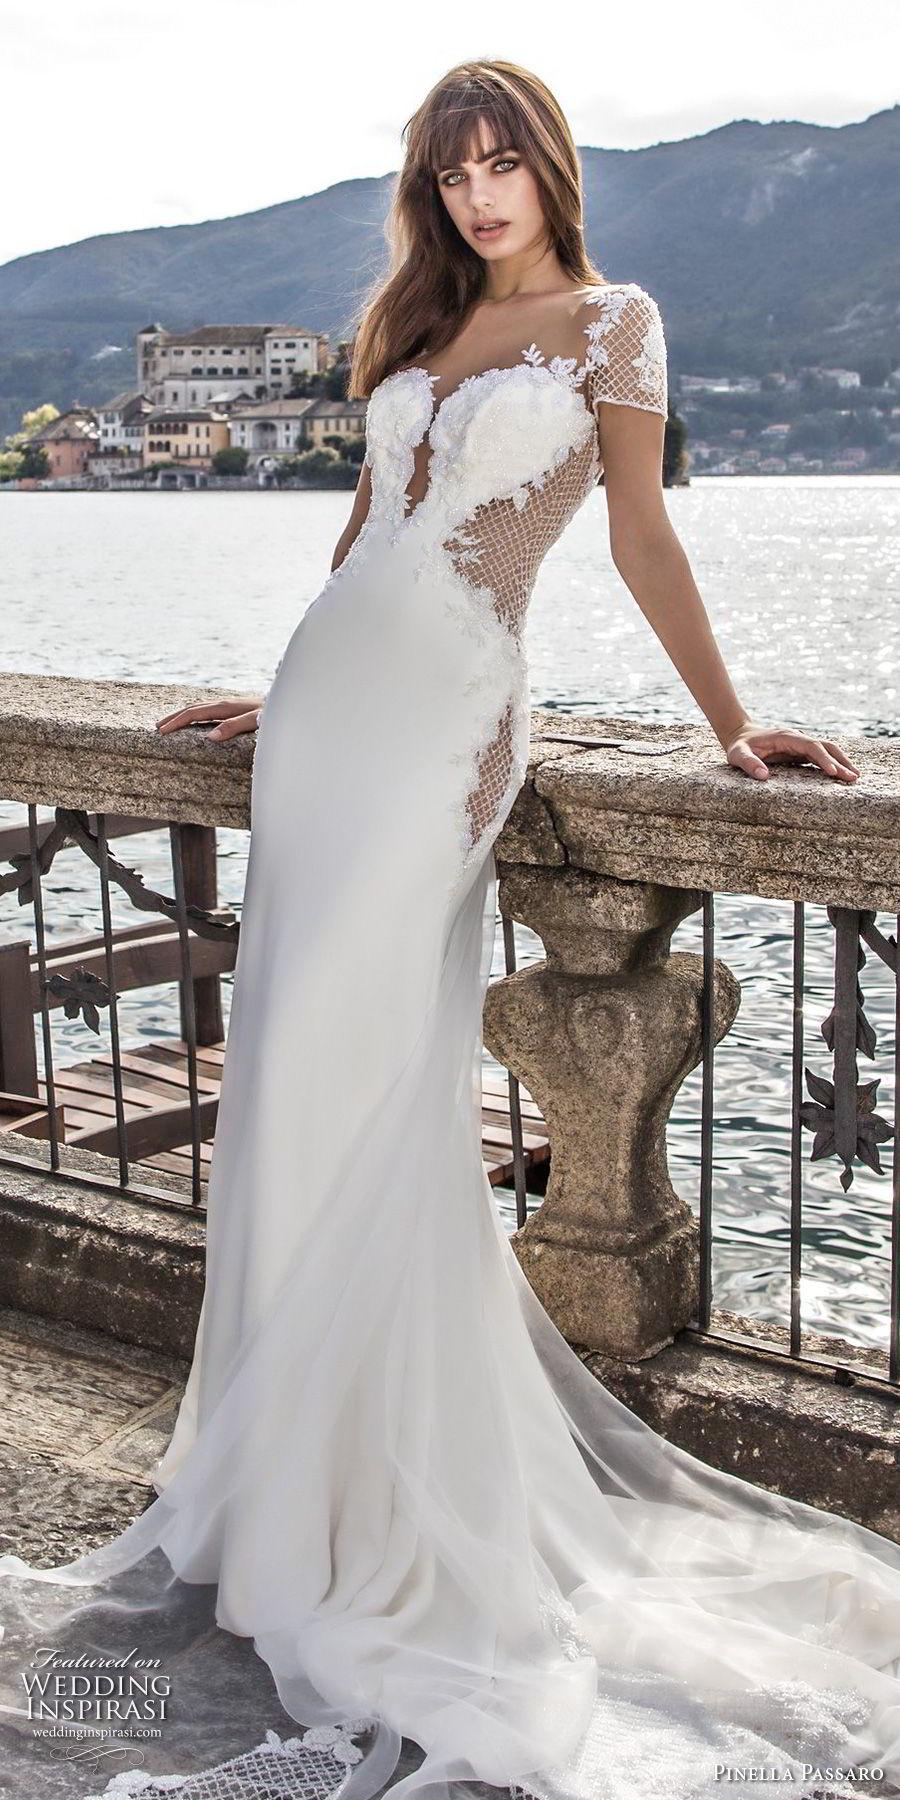 pinella passaro 2018 bridal short sleeves deep plunging sweetheart neckline heavily embellished bodice elegant sheath wedding dress open sheer back chapel train (6) lv